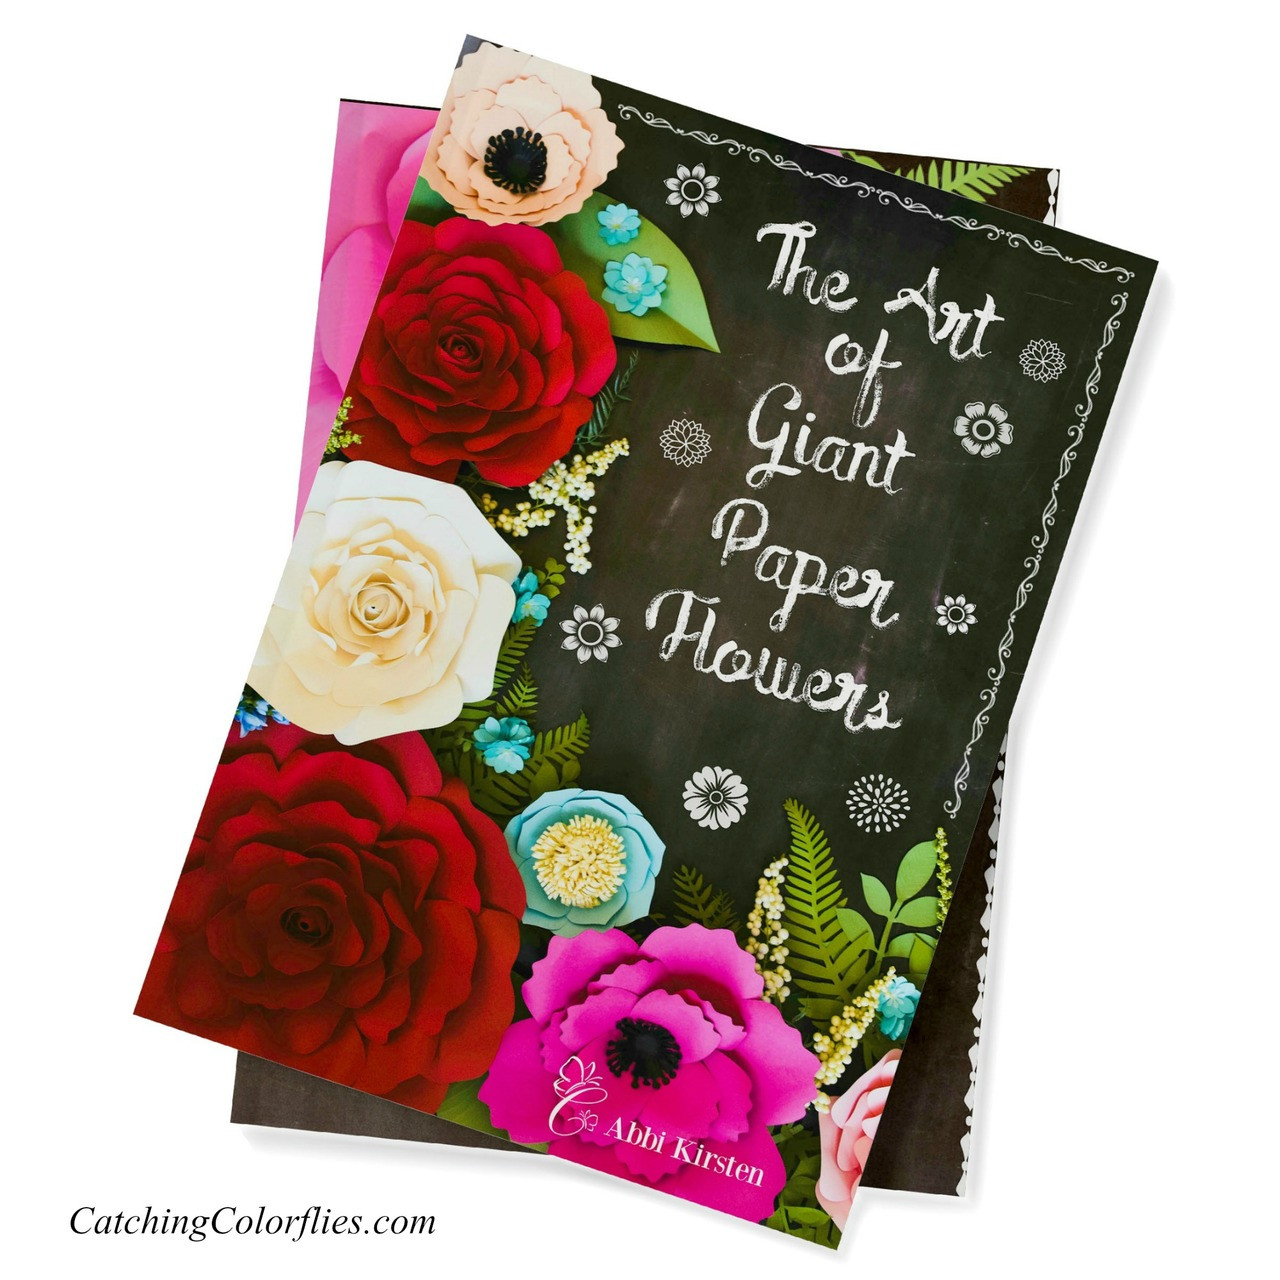 Books on paper flower making akbaeenw books mightylinksfo